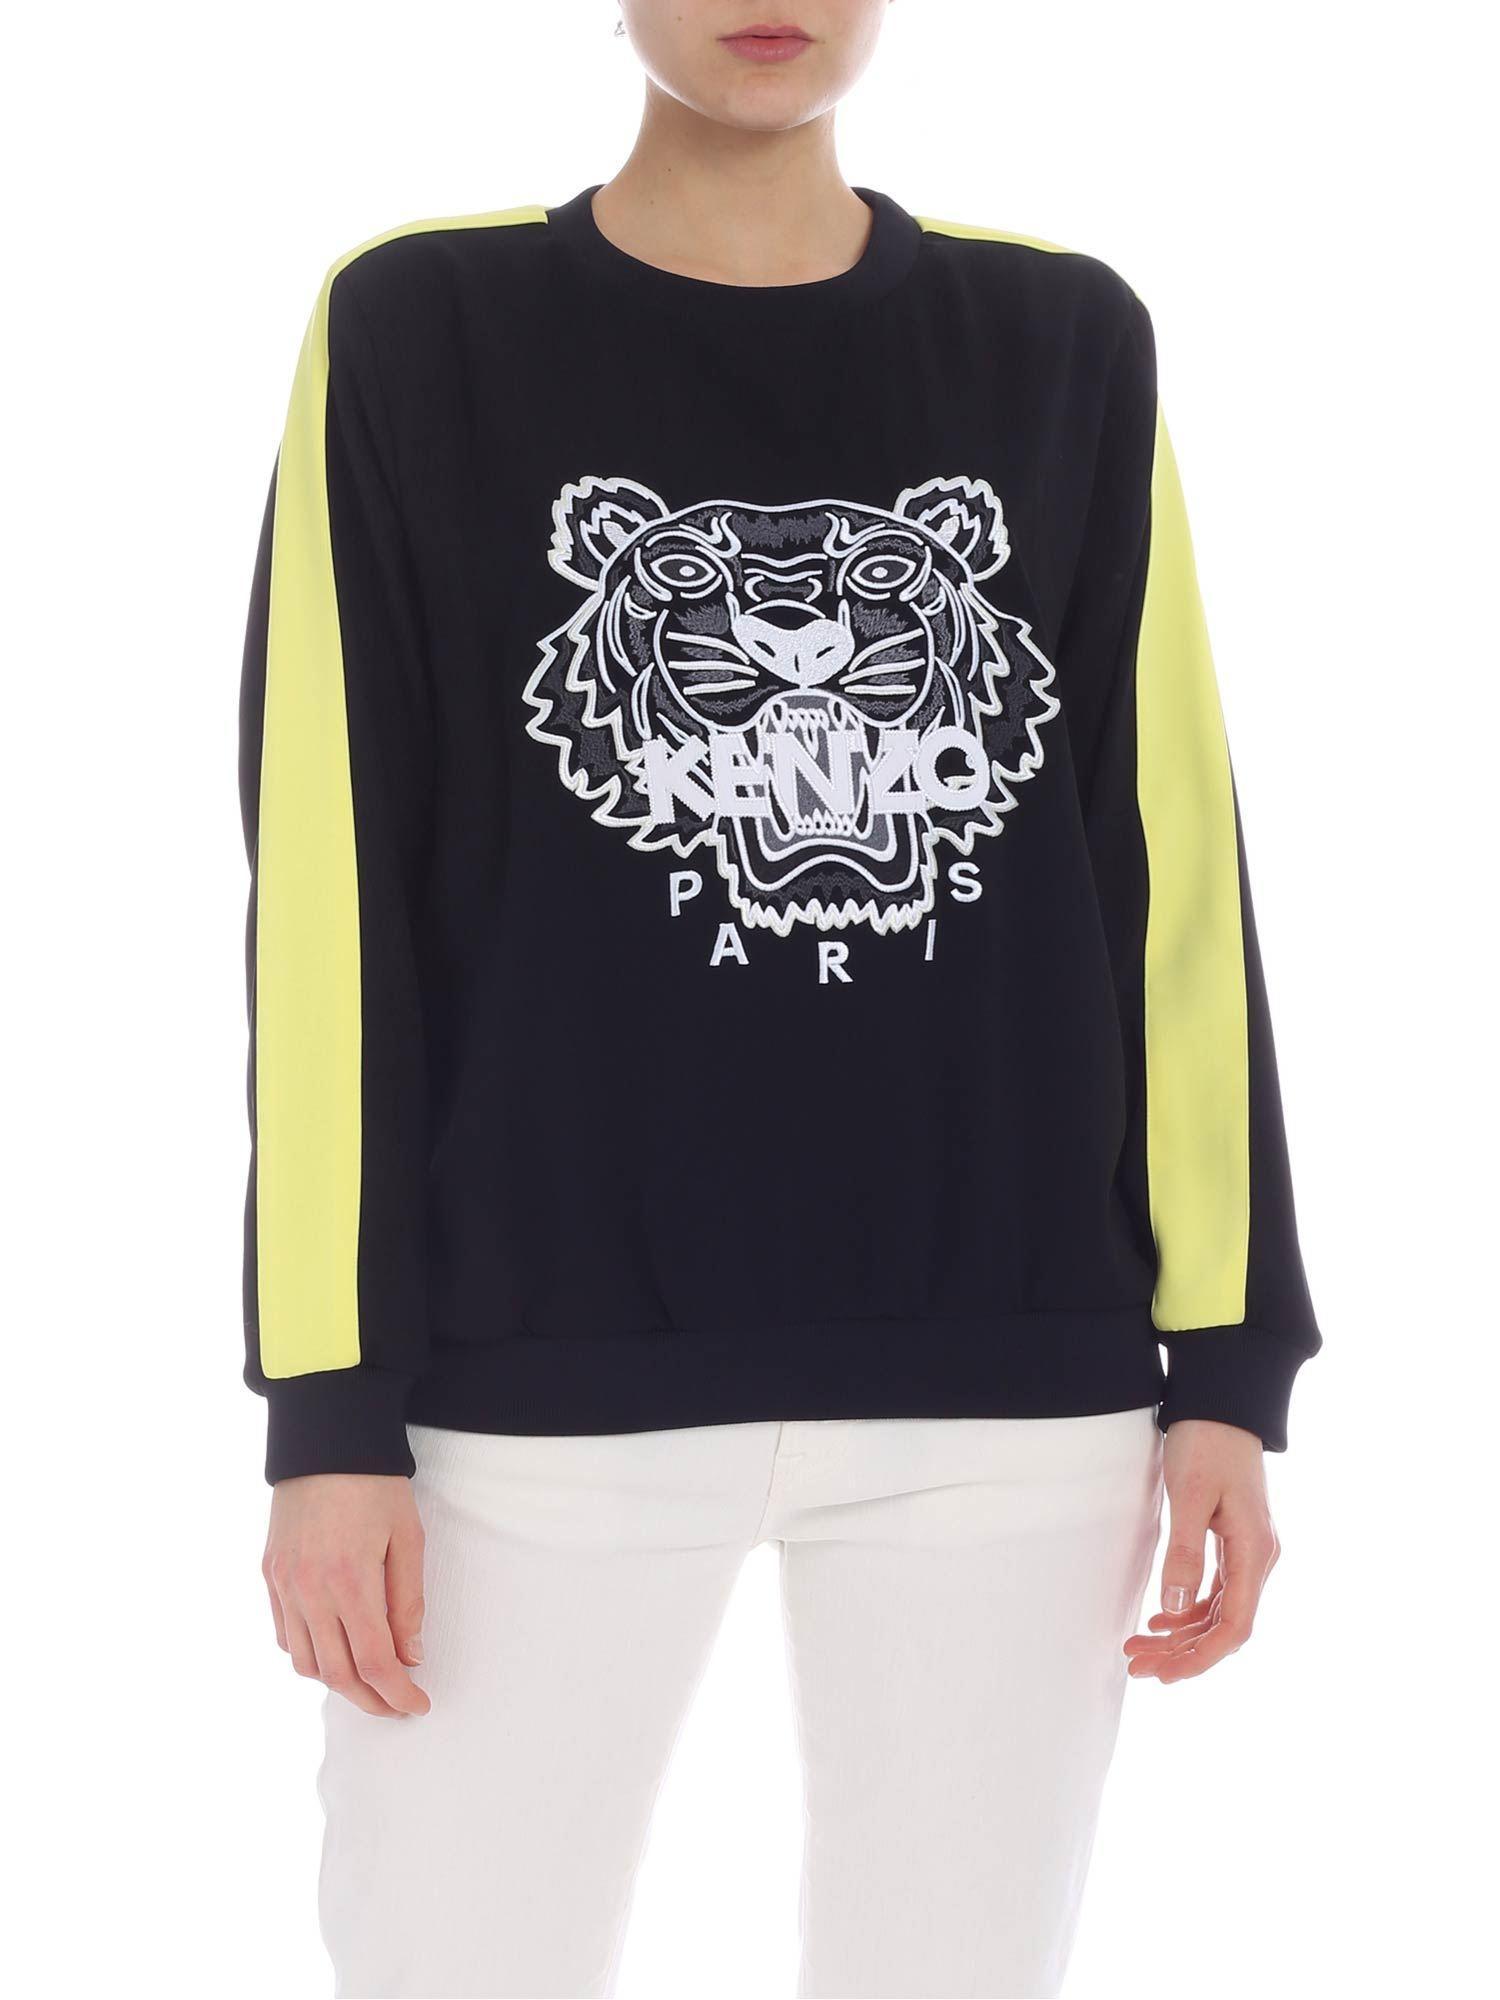 e773bdc1 Lyst - KENZO Black Tiger Sweatshirt With Yellow Band in Black